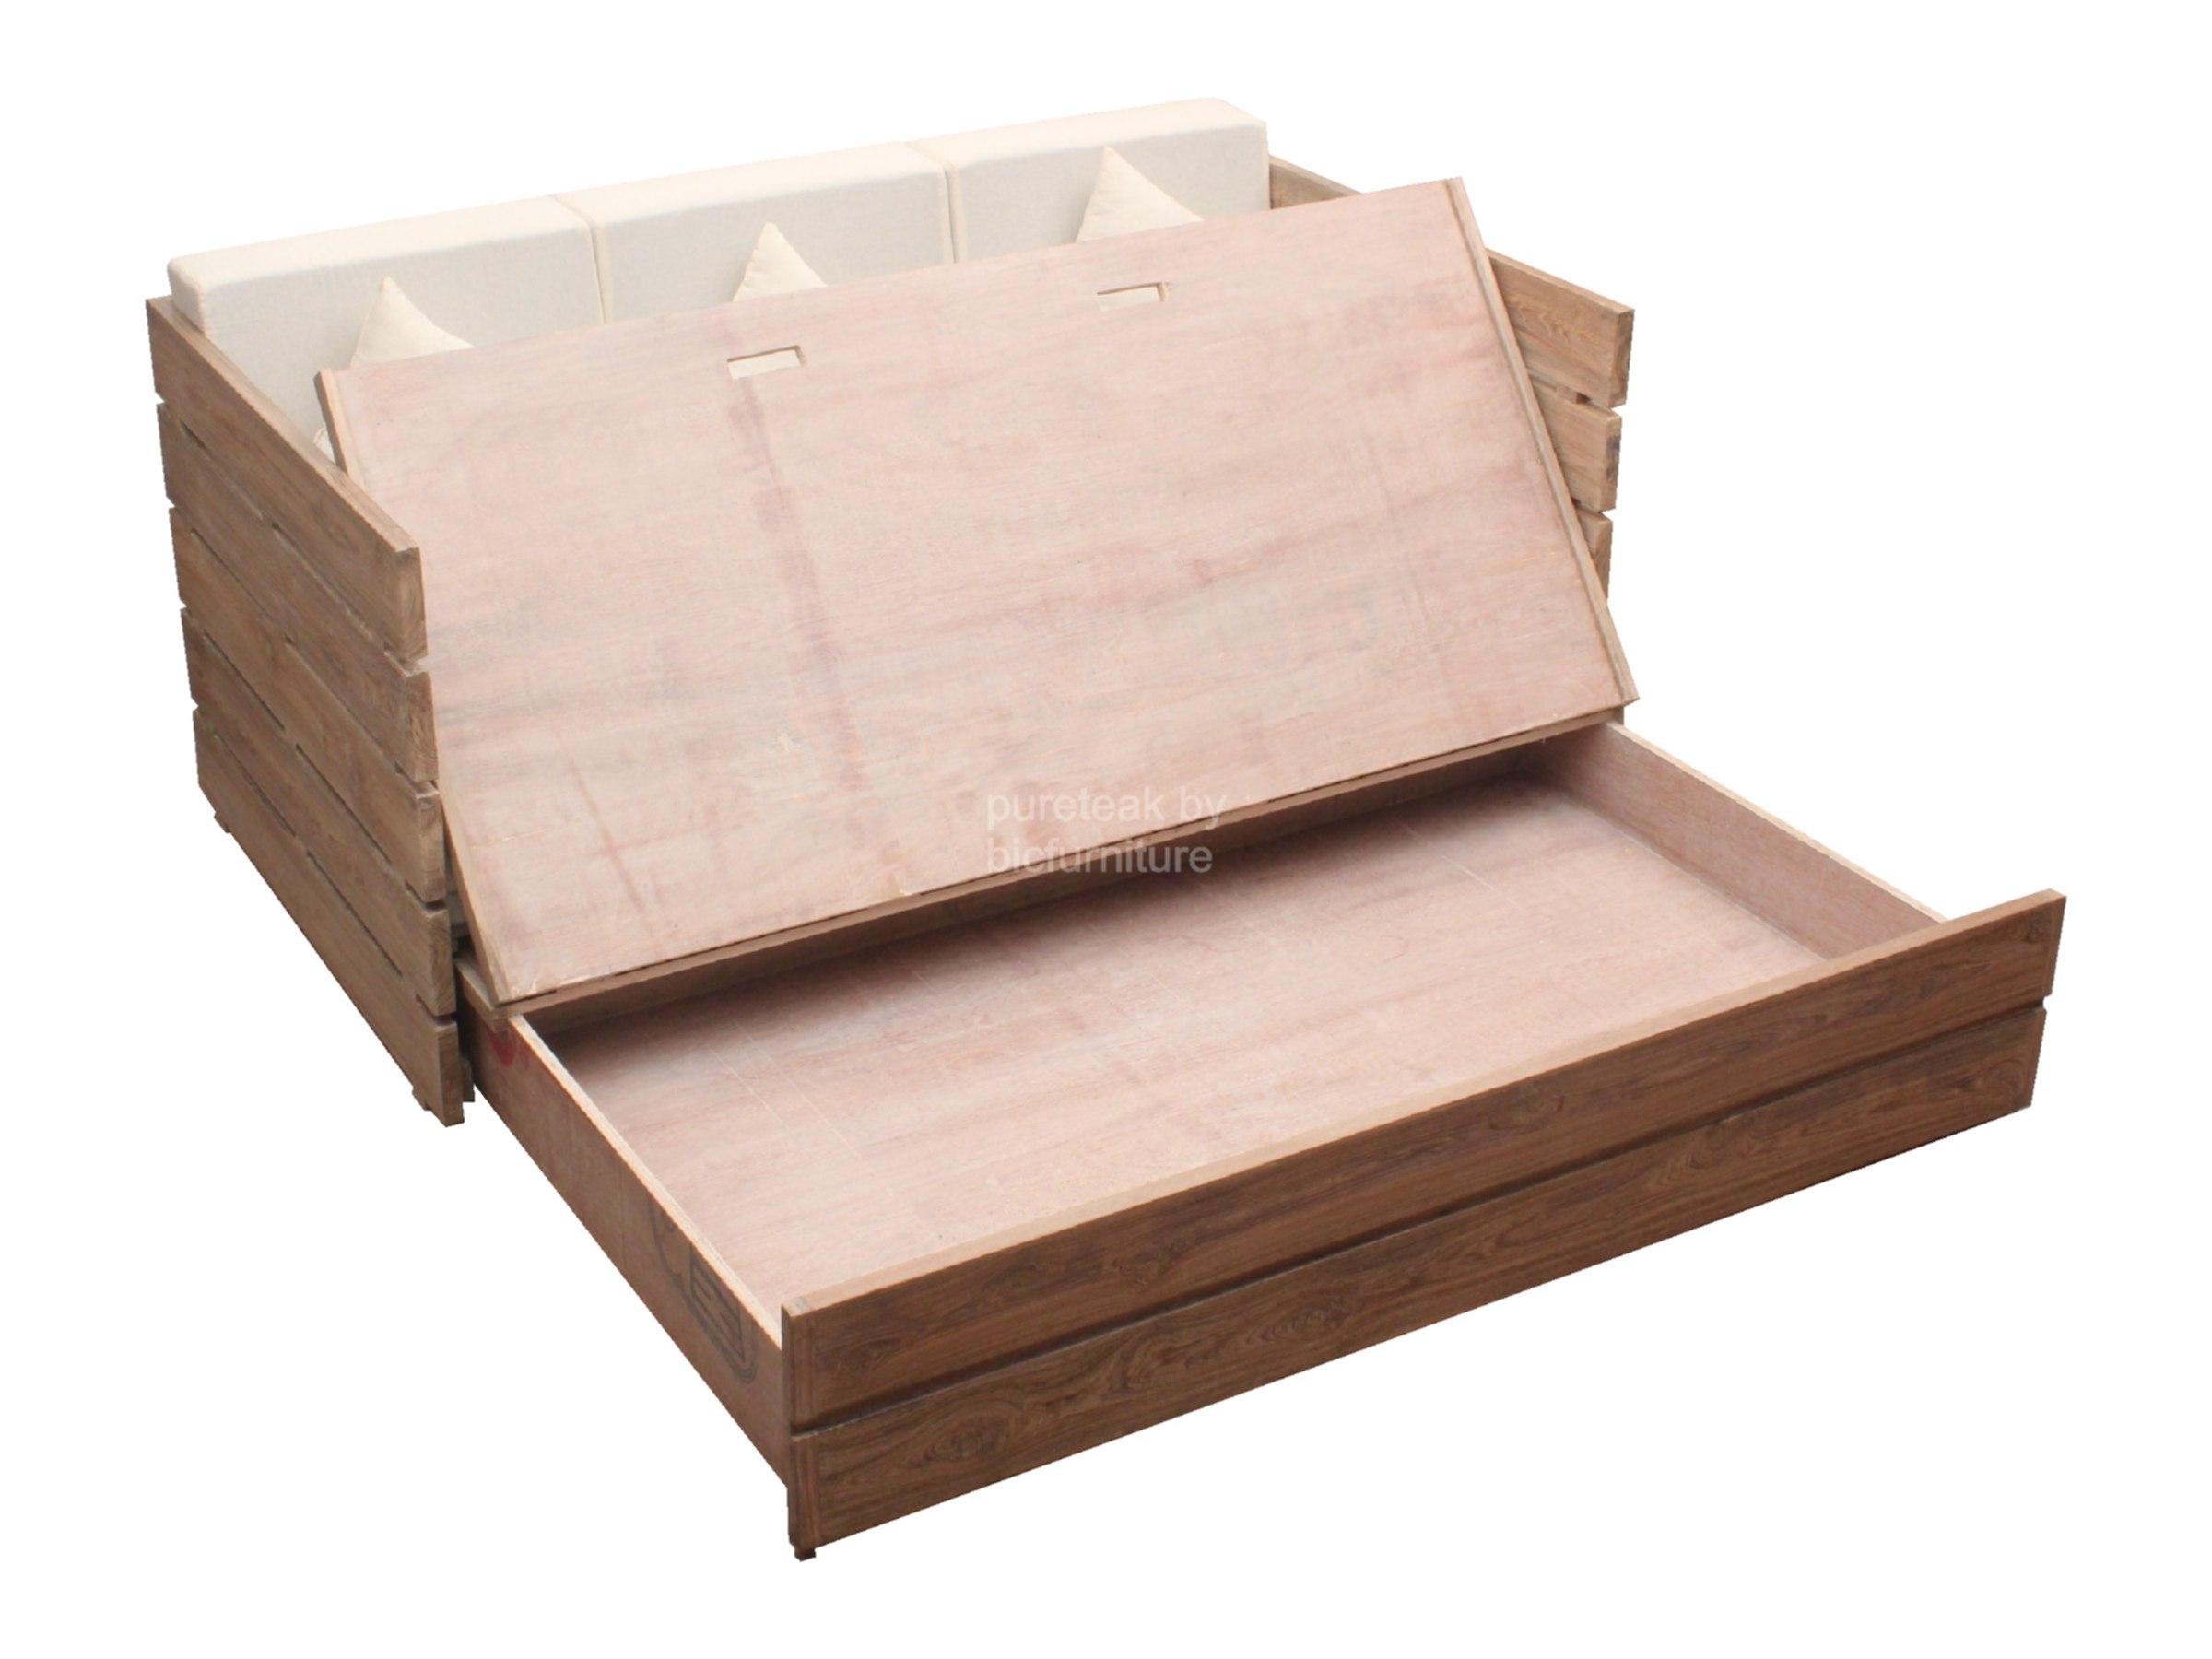 Wood sofa bed smileydot